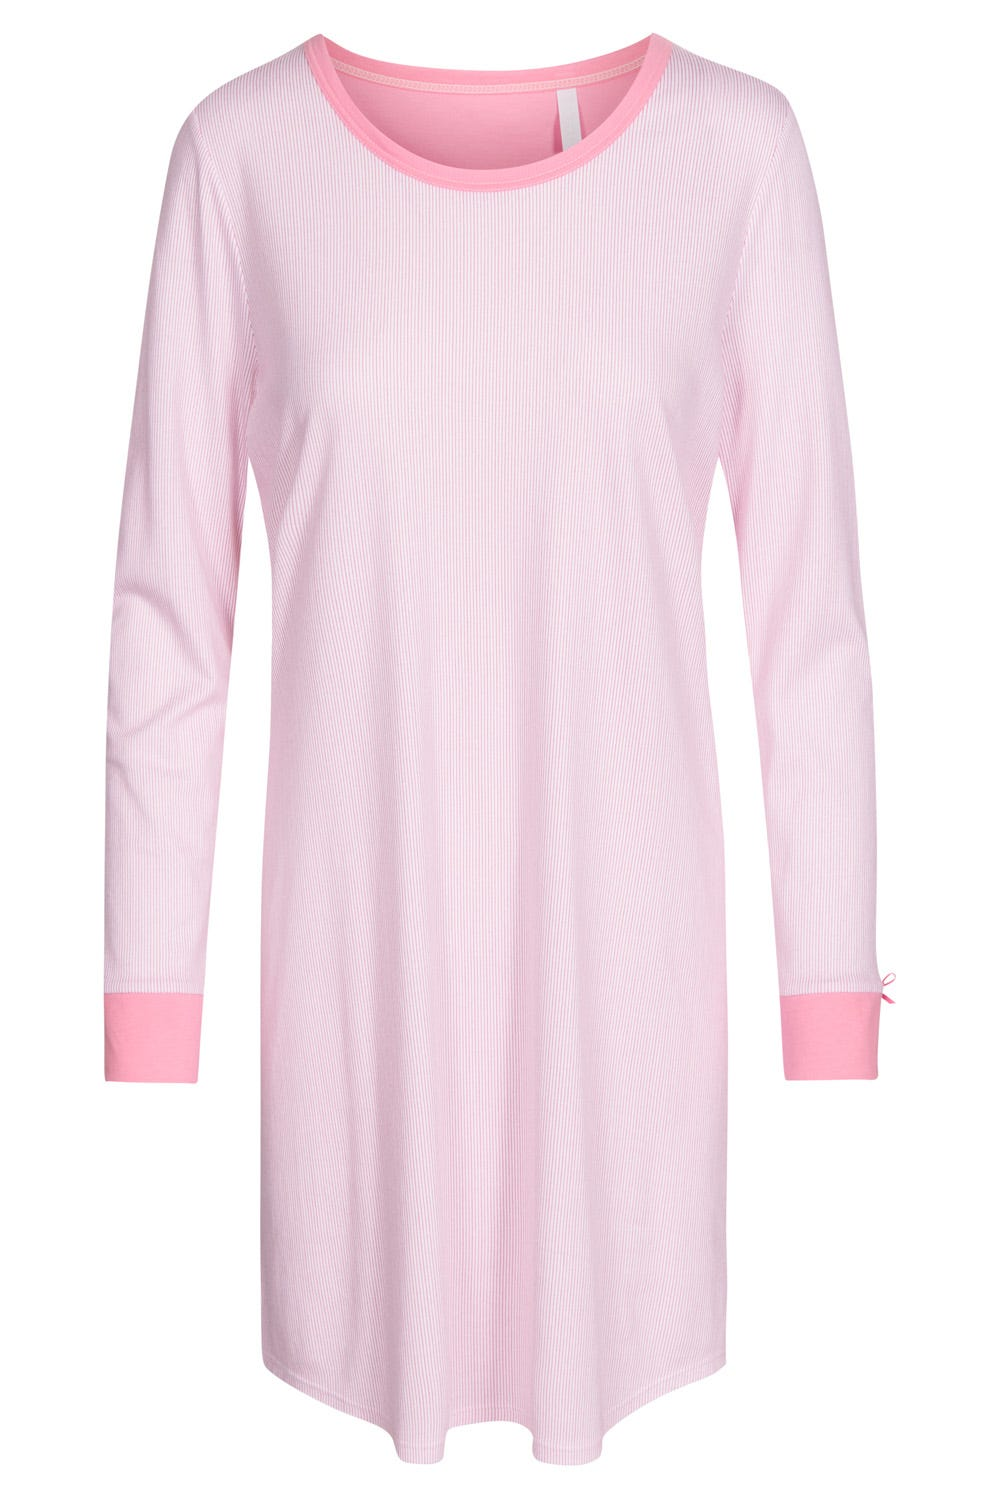 Basic Bigshirt mit Ärmelbündchenc1652238